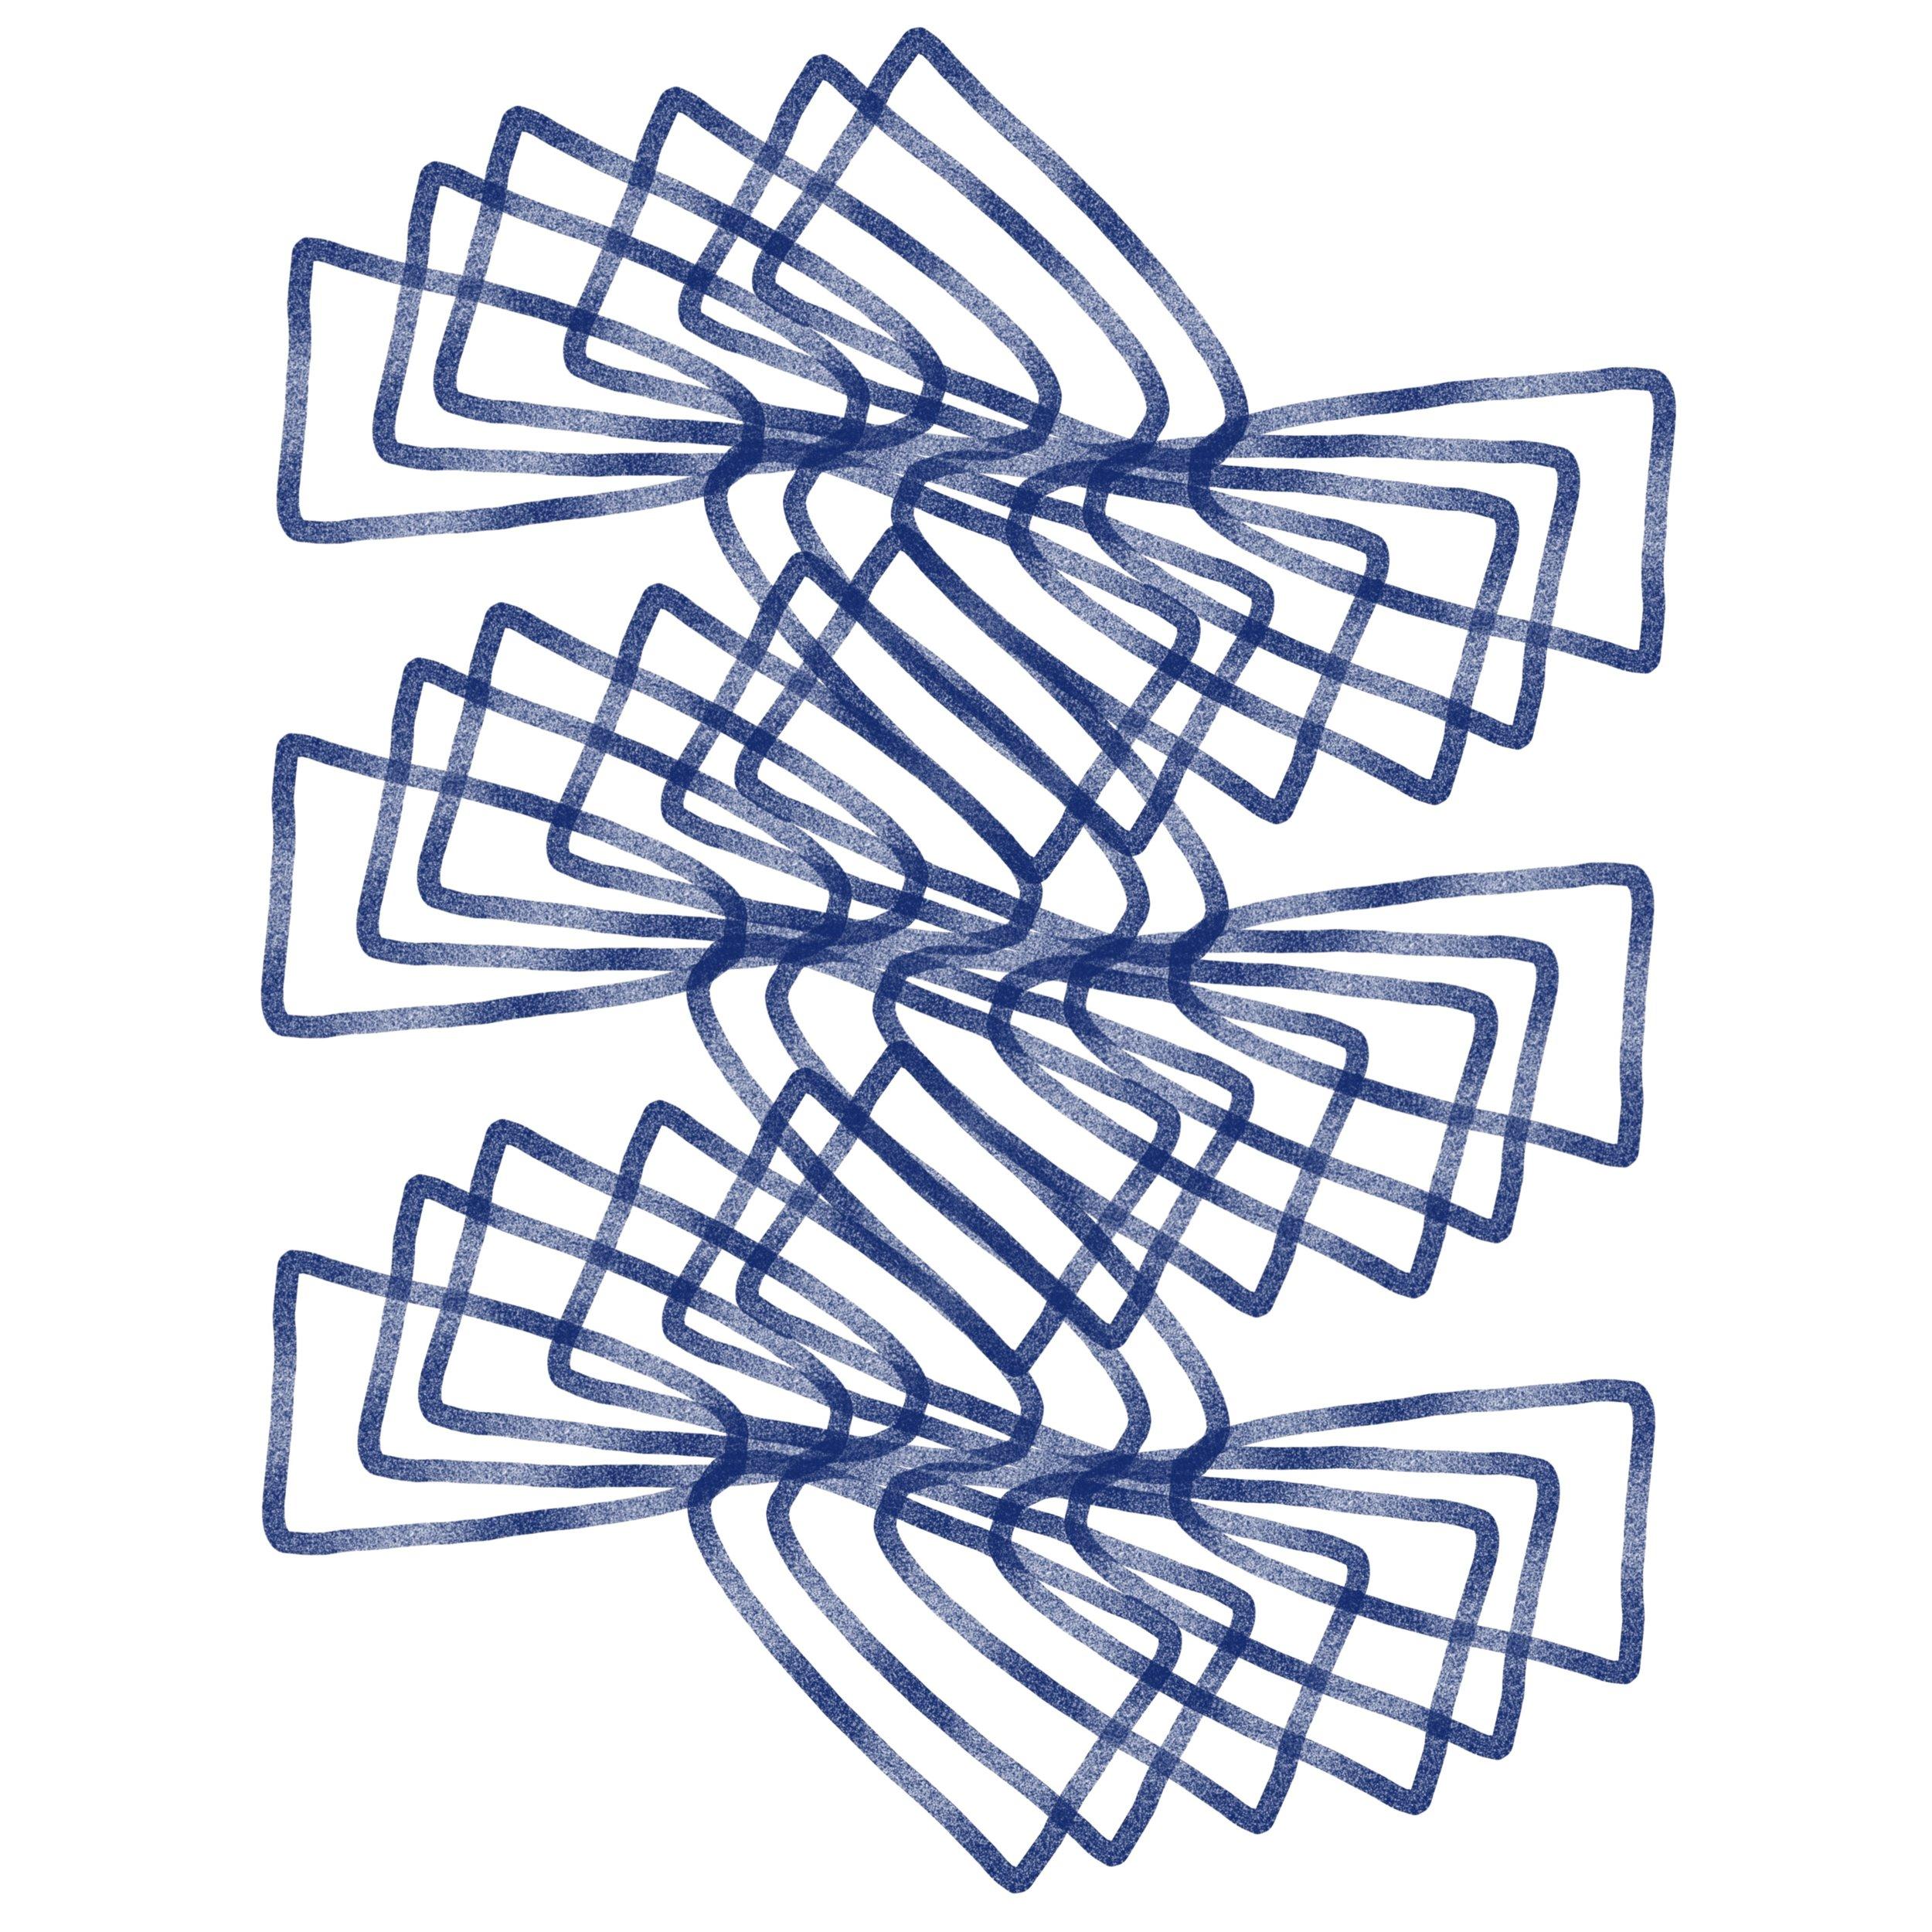 Kinetic Lines 1